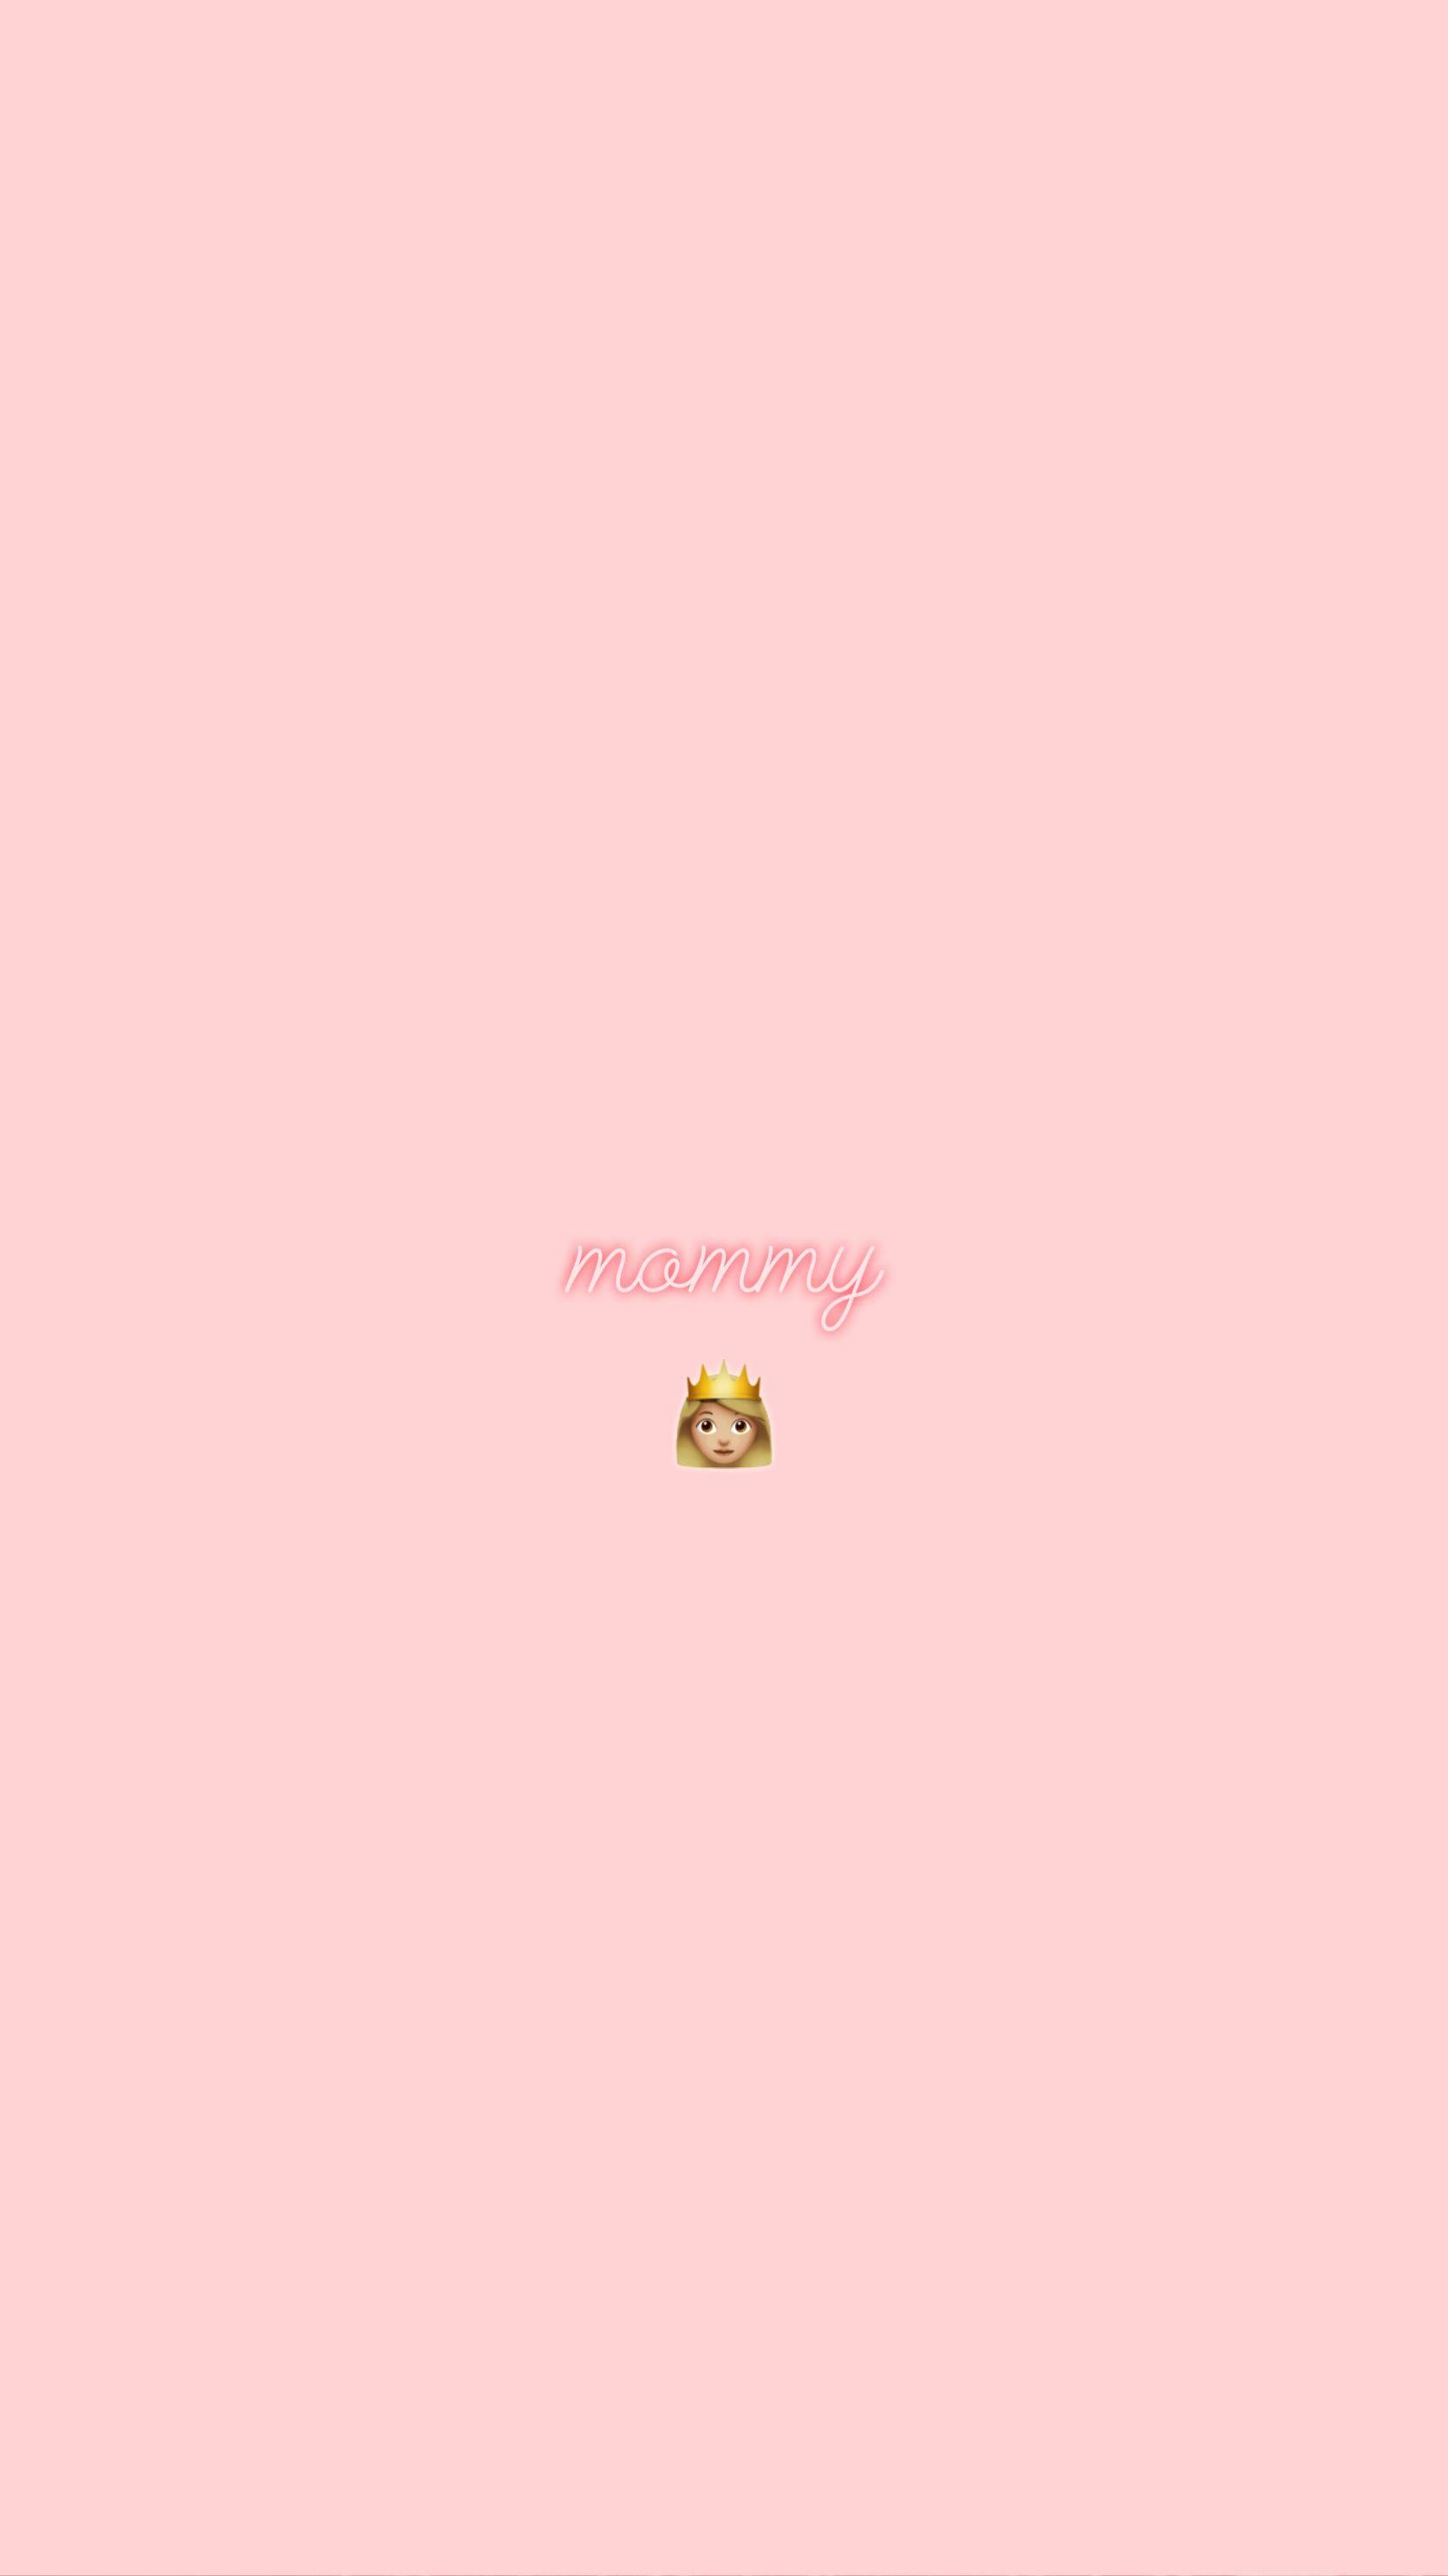 Pin by kyy 🚀 on WALLPAPERS . Cute emoji wallpaper